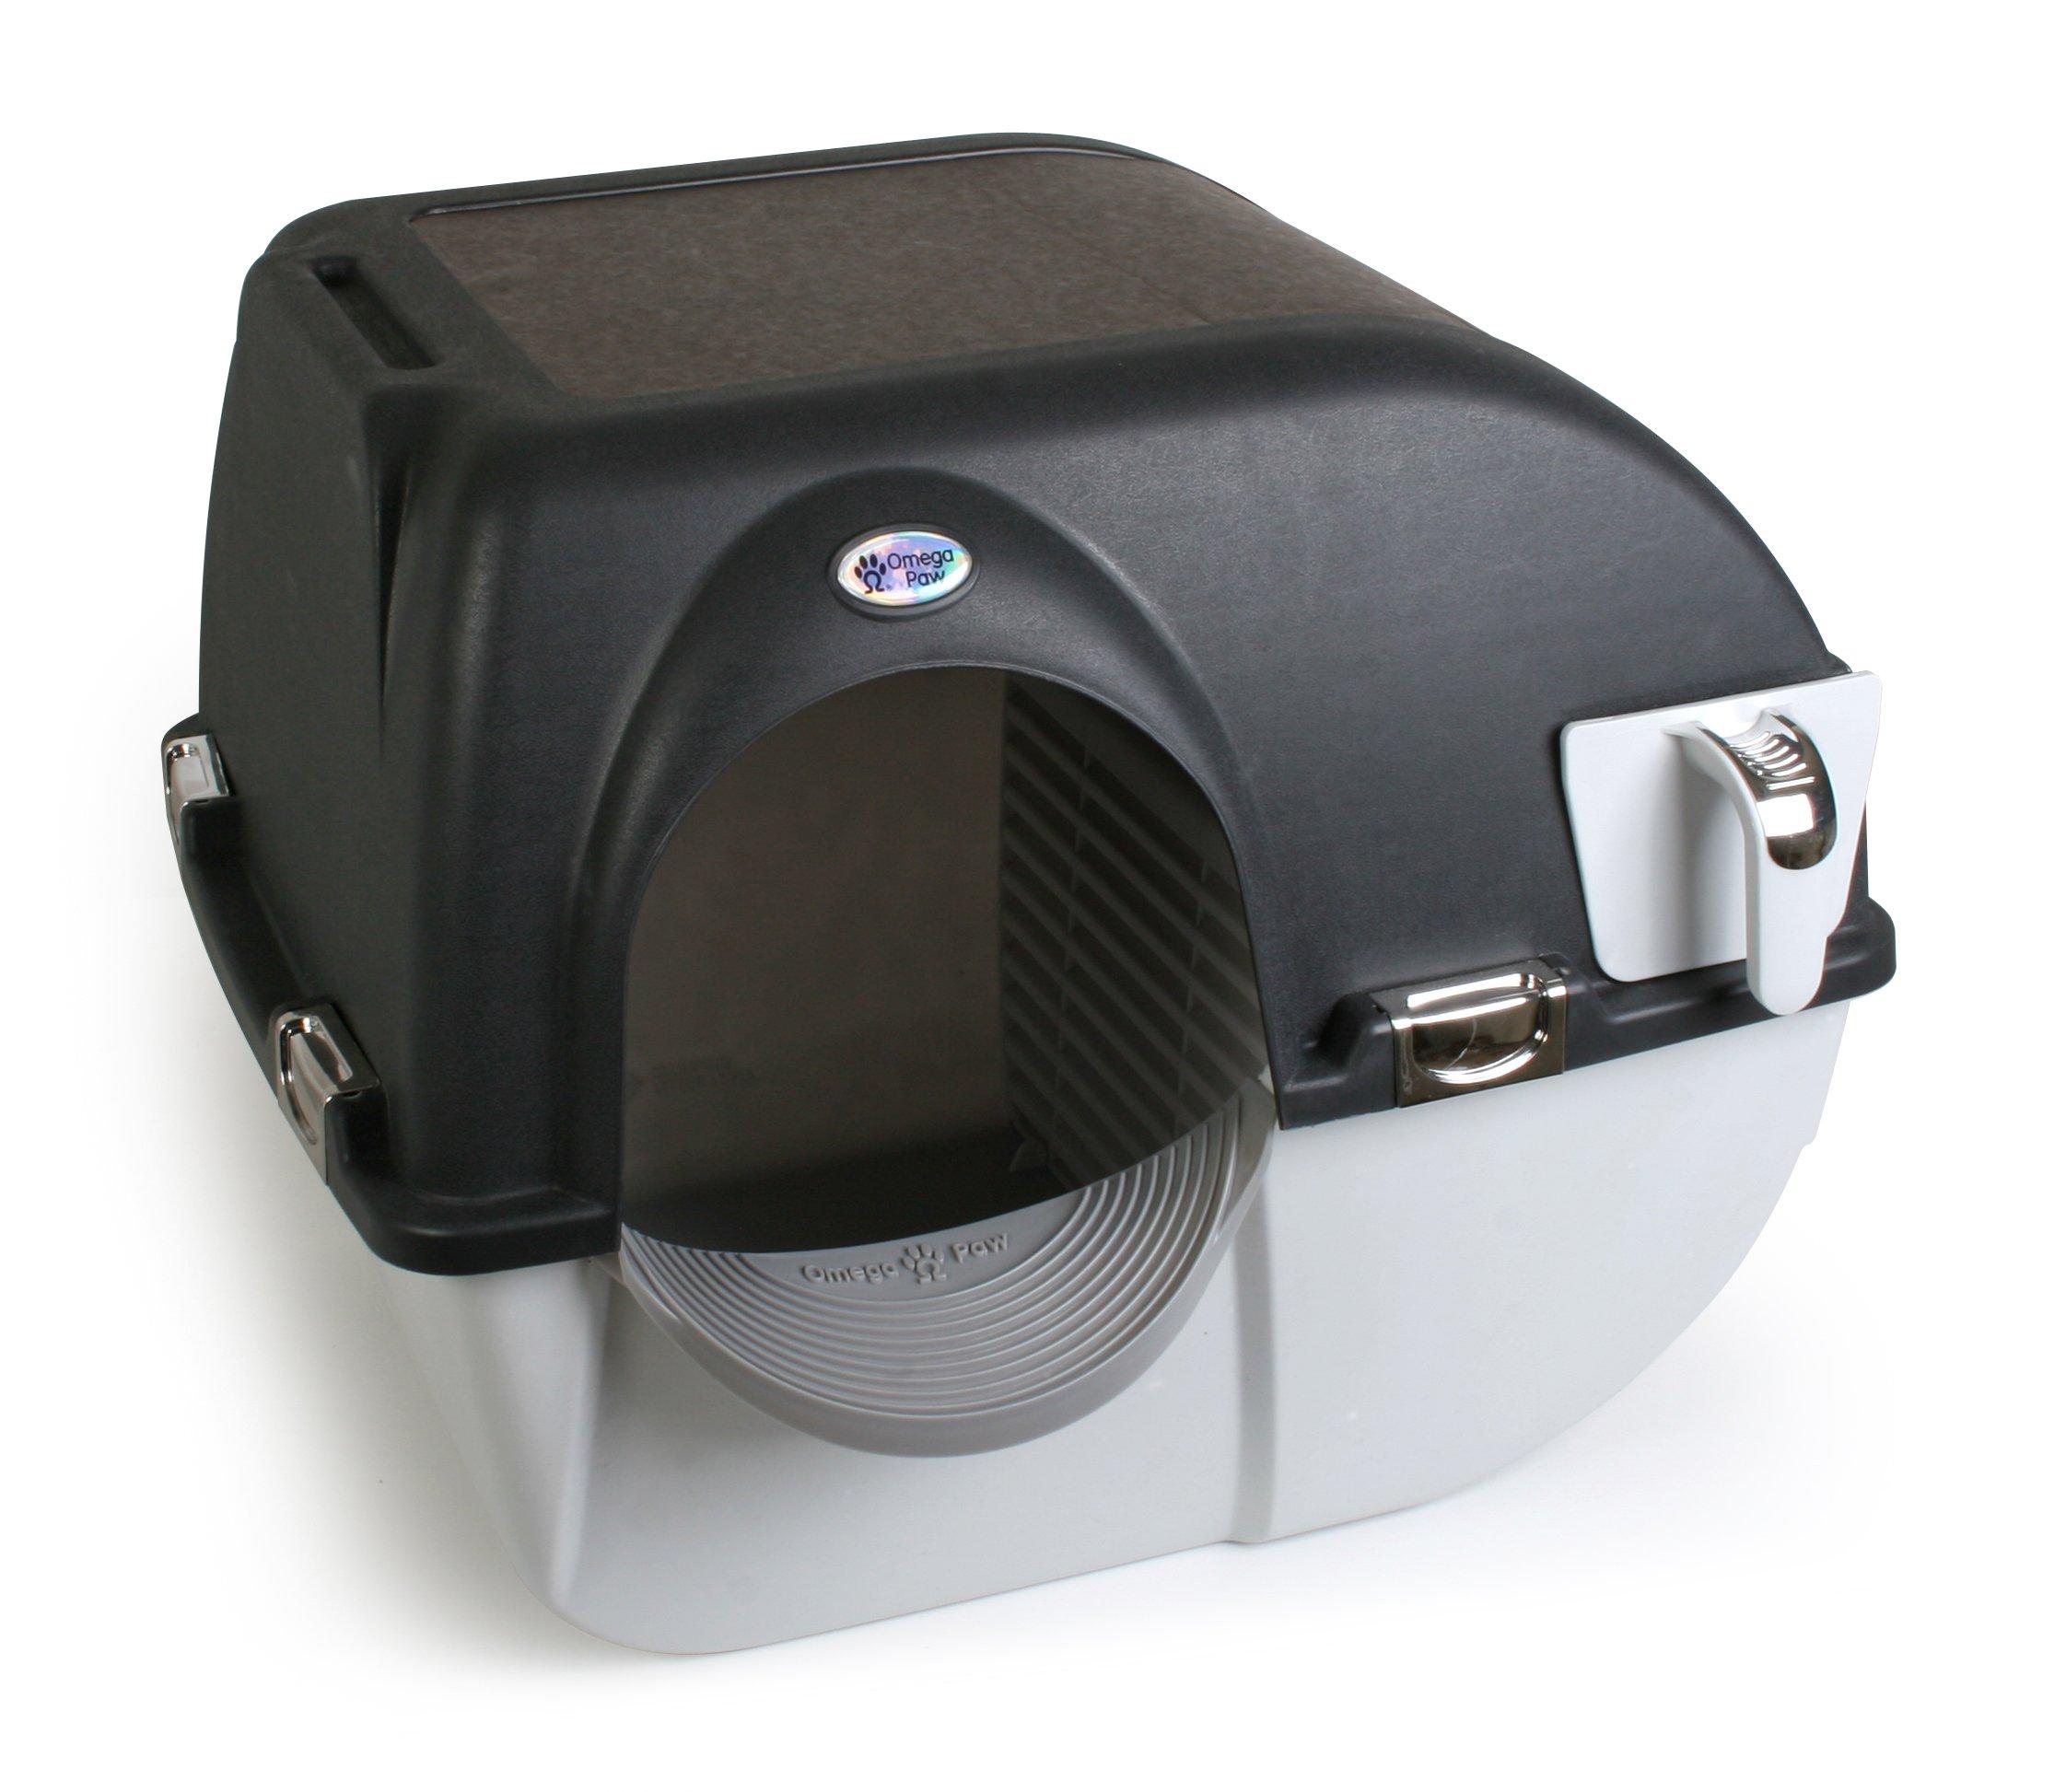 Omega Paw EL-RA15-1 Elite Roll 'n Clean Litter Box, Regular, Midnight Black